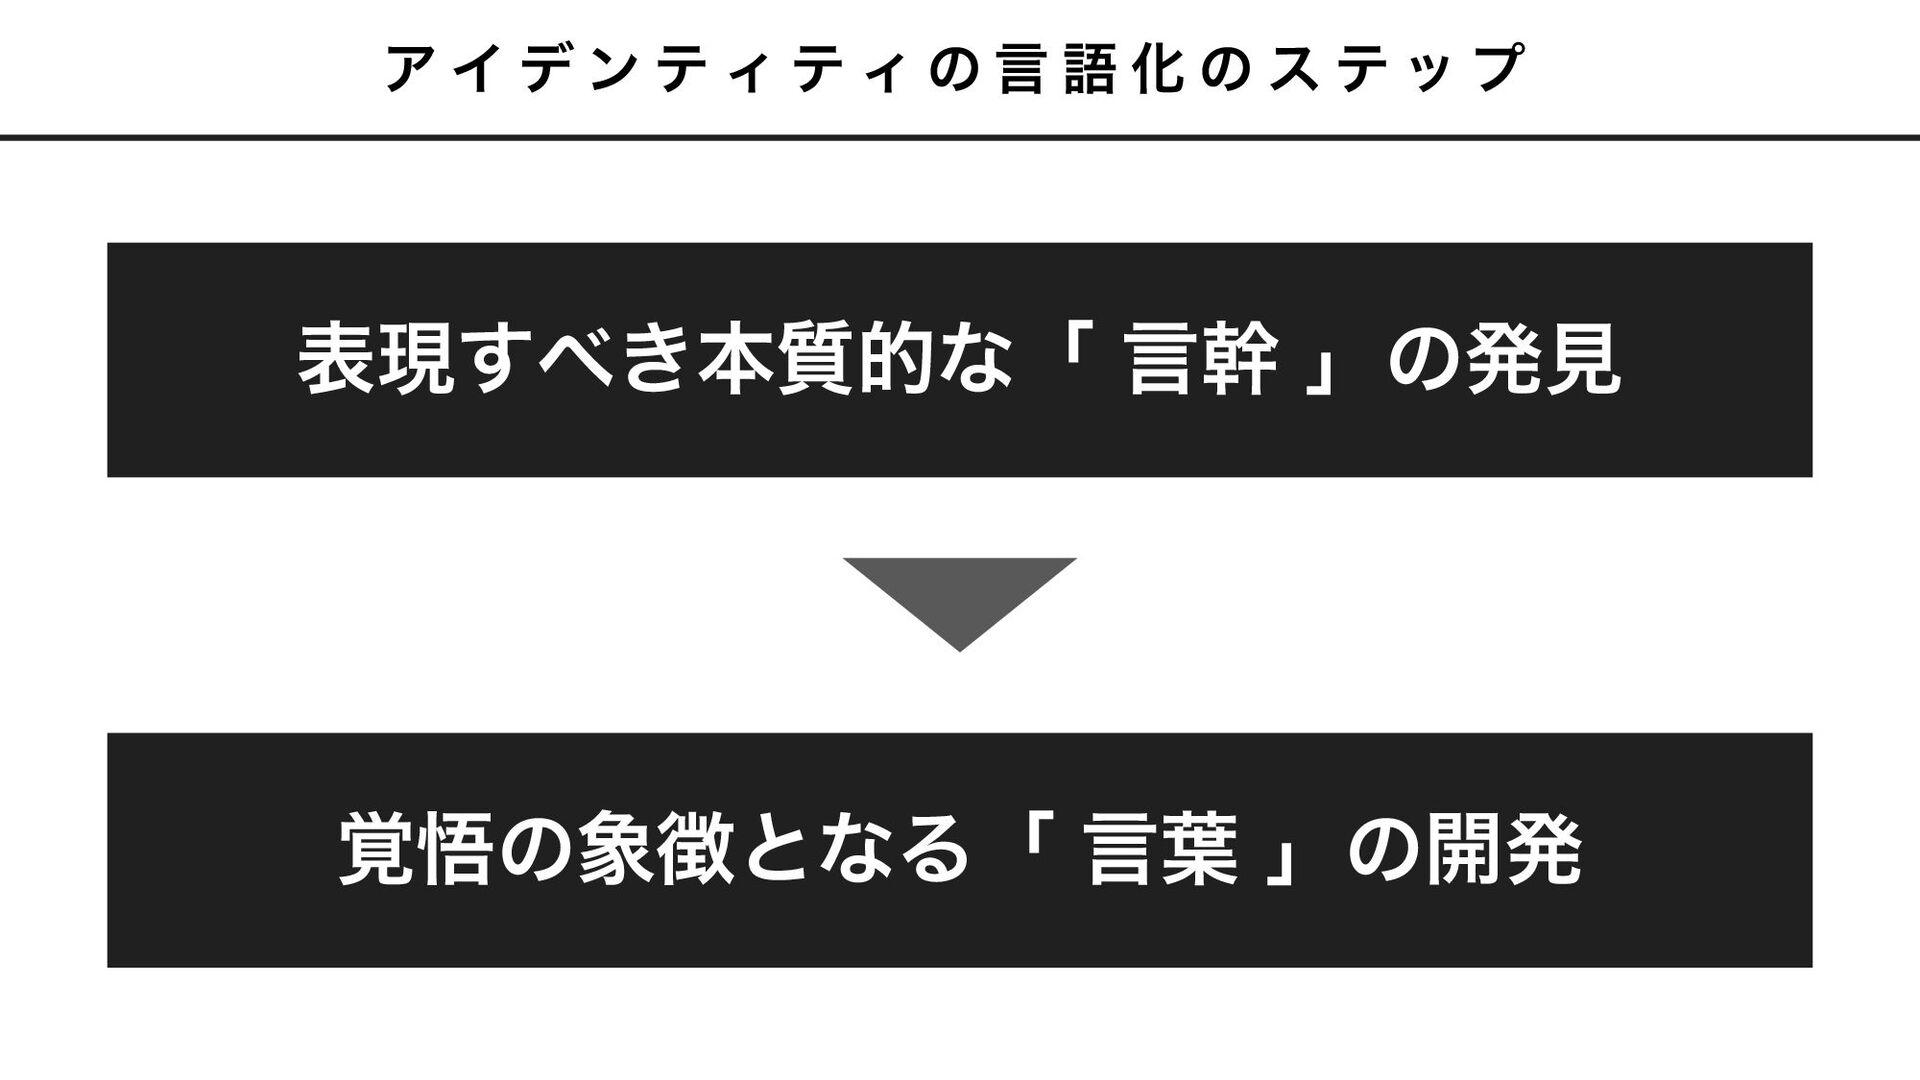 CO- ཧ೦ͷ ॏͳΓ SIGN اۀཧ೦ اۀͷ֮ޛͷ બͷಈػɾج४ ͳͥݸਓʹ֮...